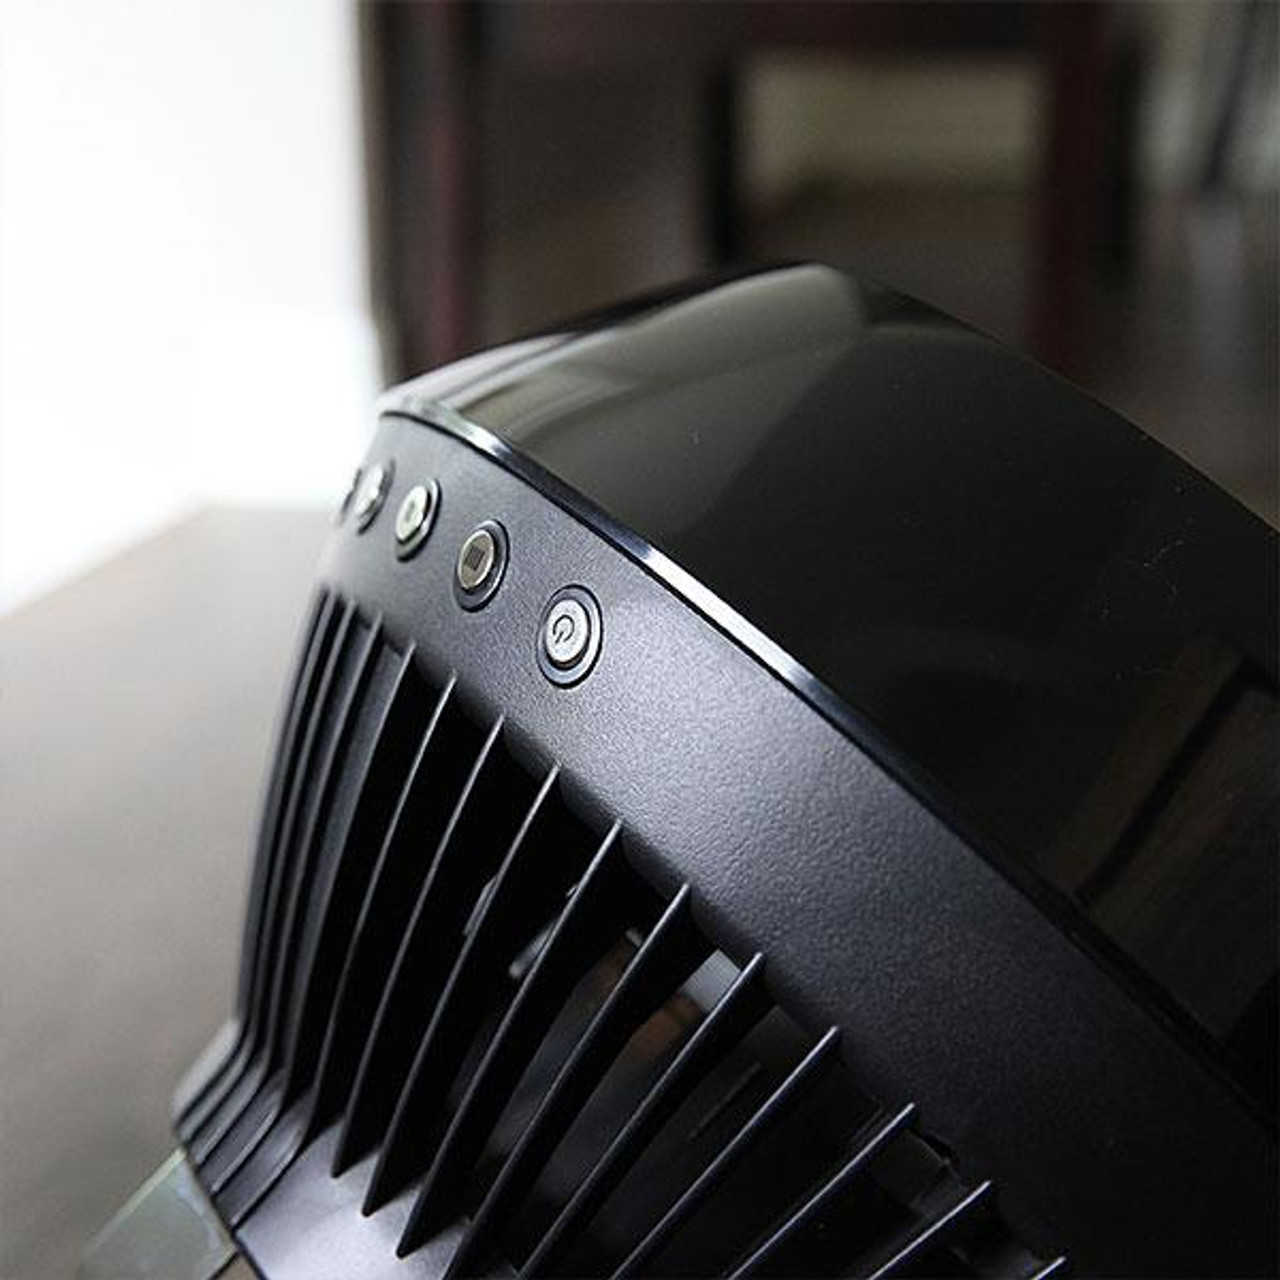 Vornado 71660 Large Air Circulator 25cm Floor Fan - Black